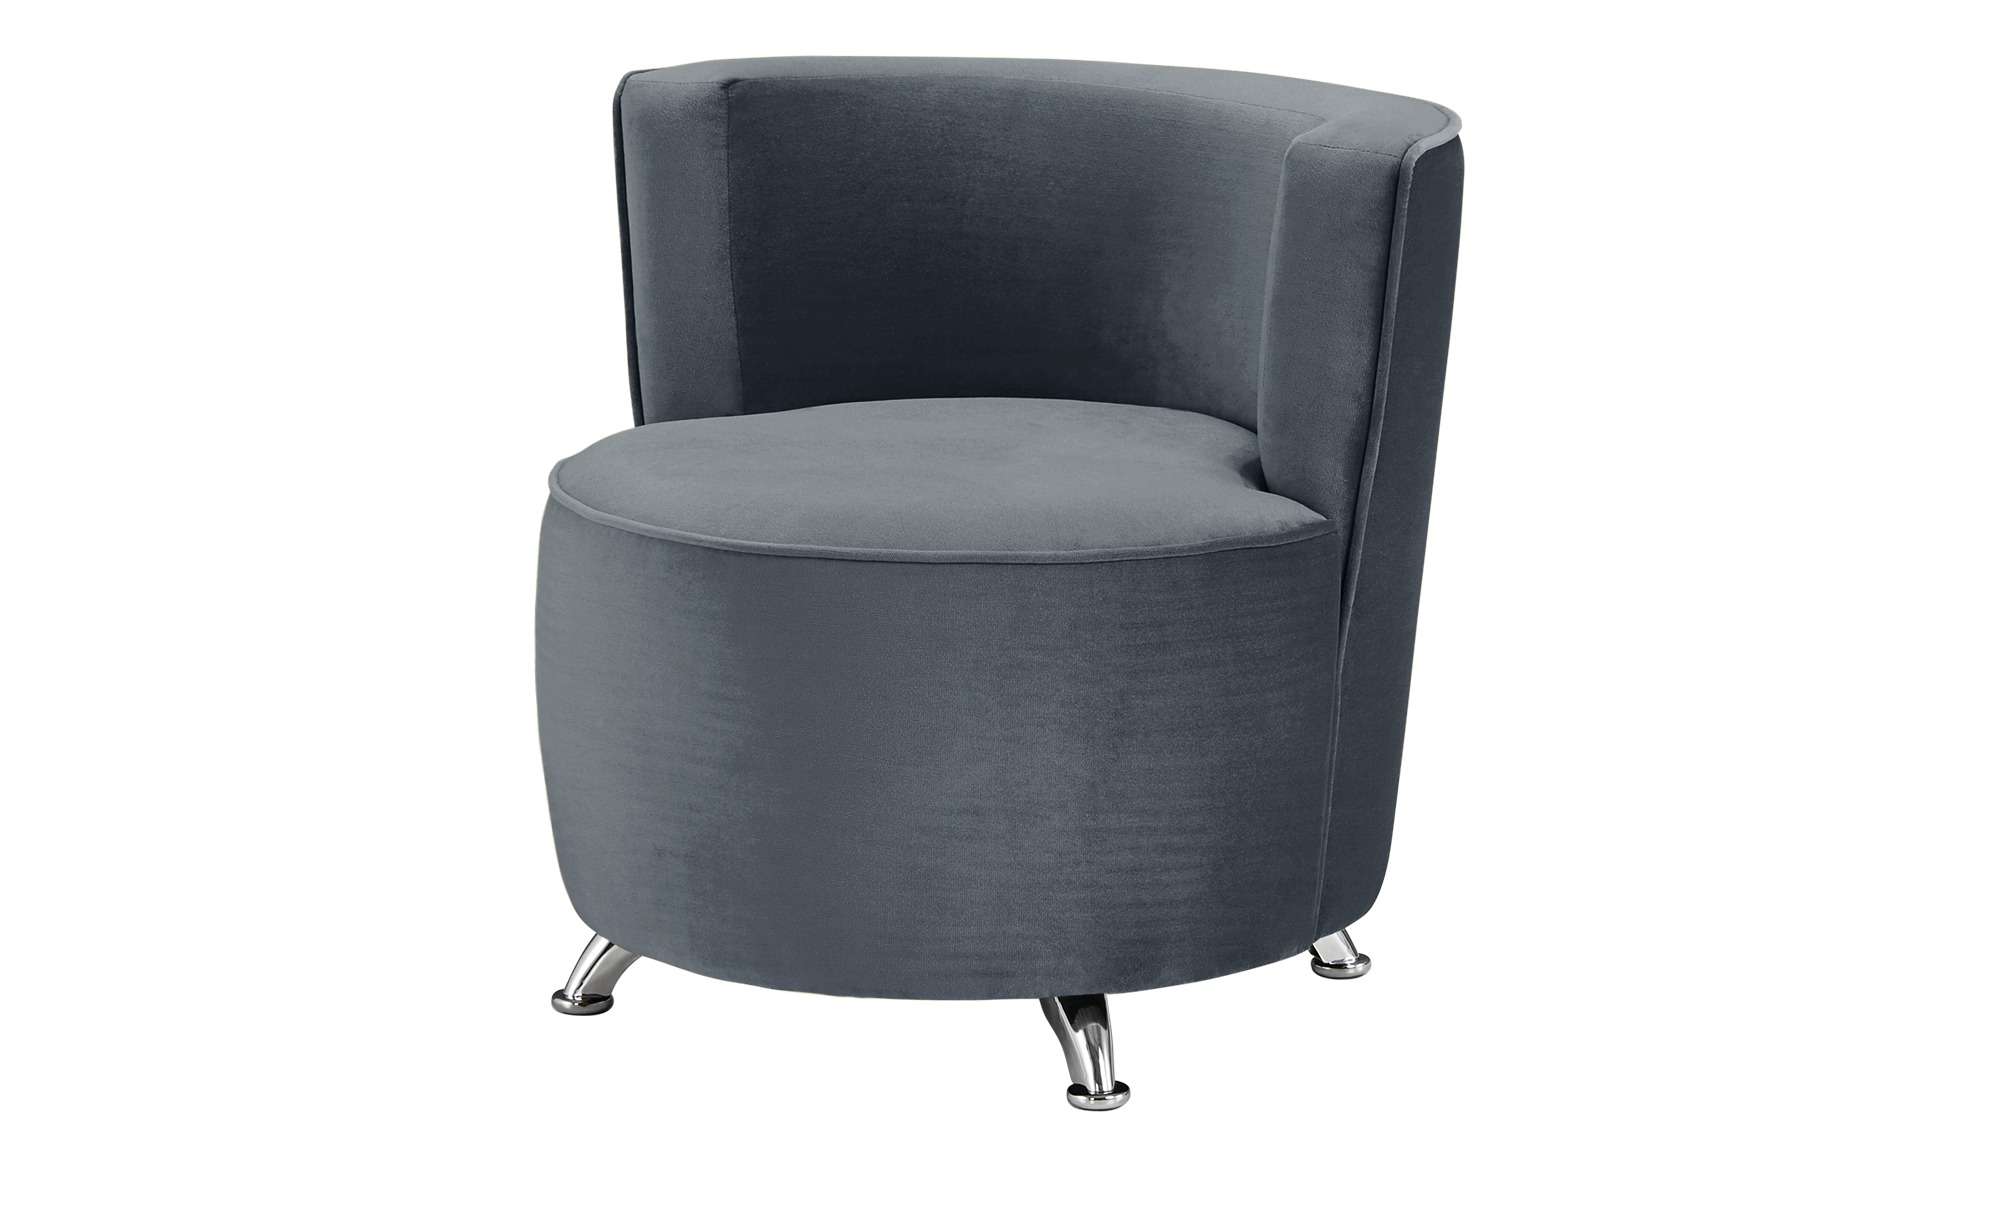 smart Sessel - grau - 76 cm - 71 cm - 74 cm - Polstermöbel > Sessel > Cocktailsessel - Möbel Kraft | Wohnzimmer > Sessel > Cocktailsessel & Clubsessel | smart